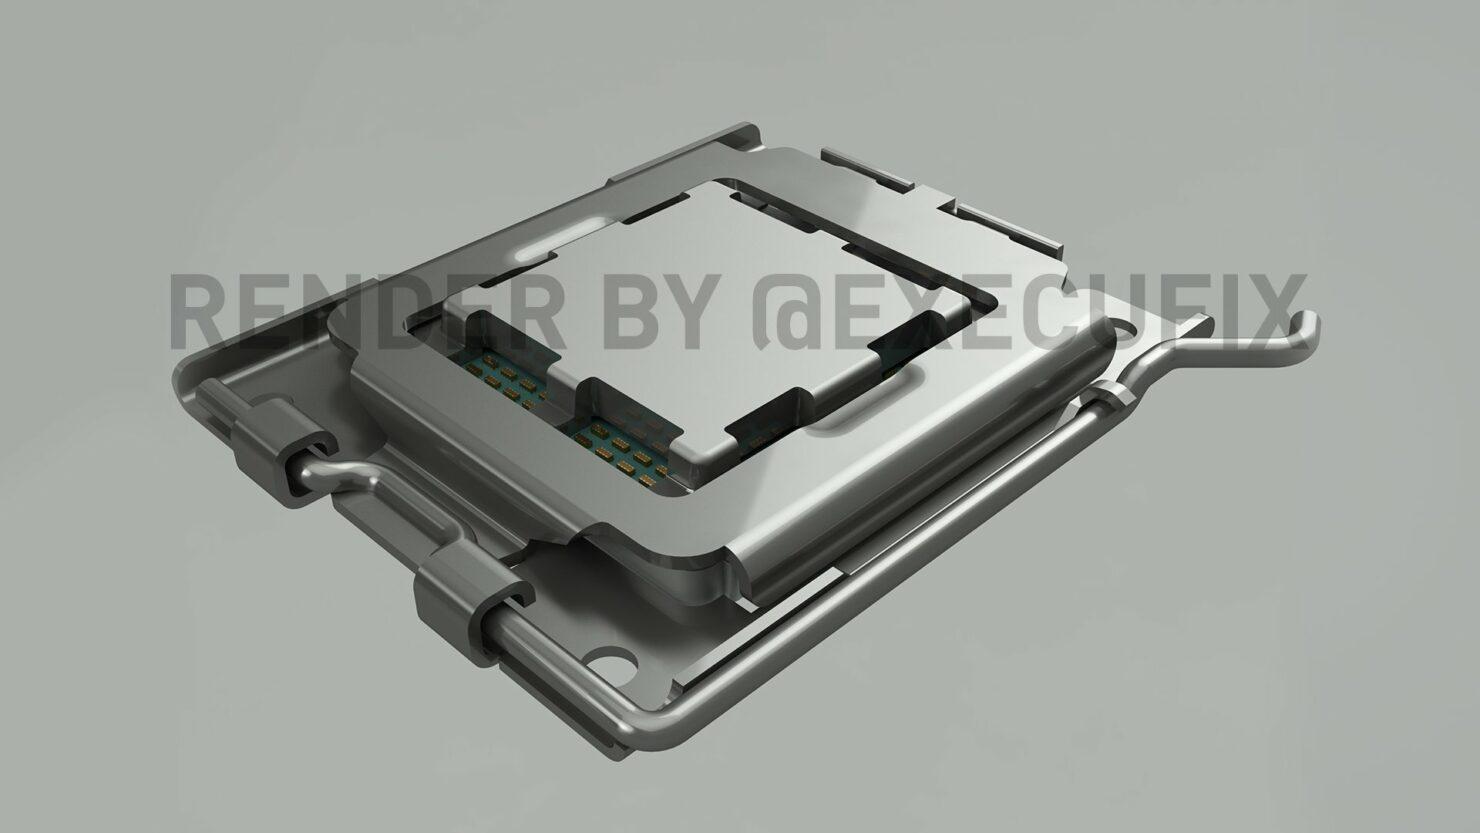 amd-am5-lga-1718-socket-for-next-gen-amd-ryzen-desktop-cpus-render-_1